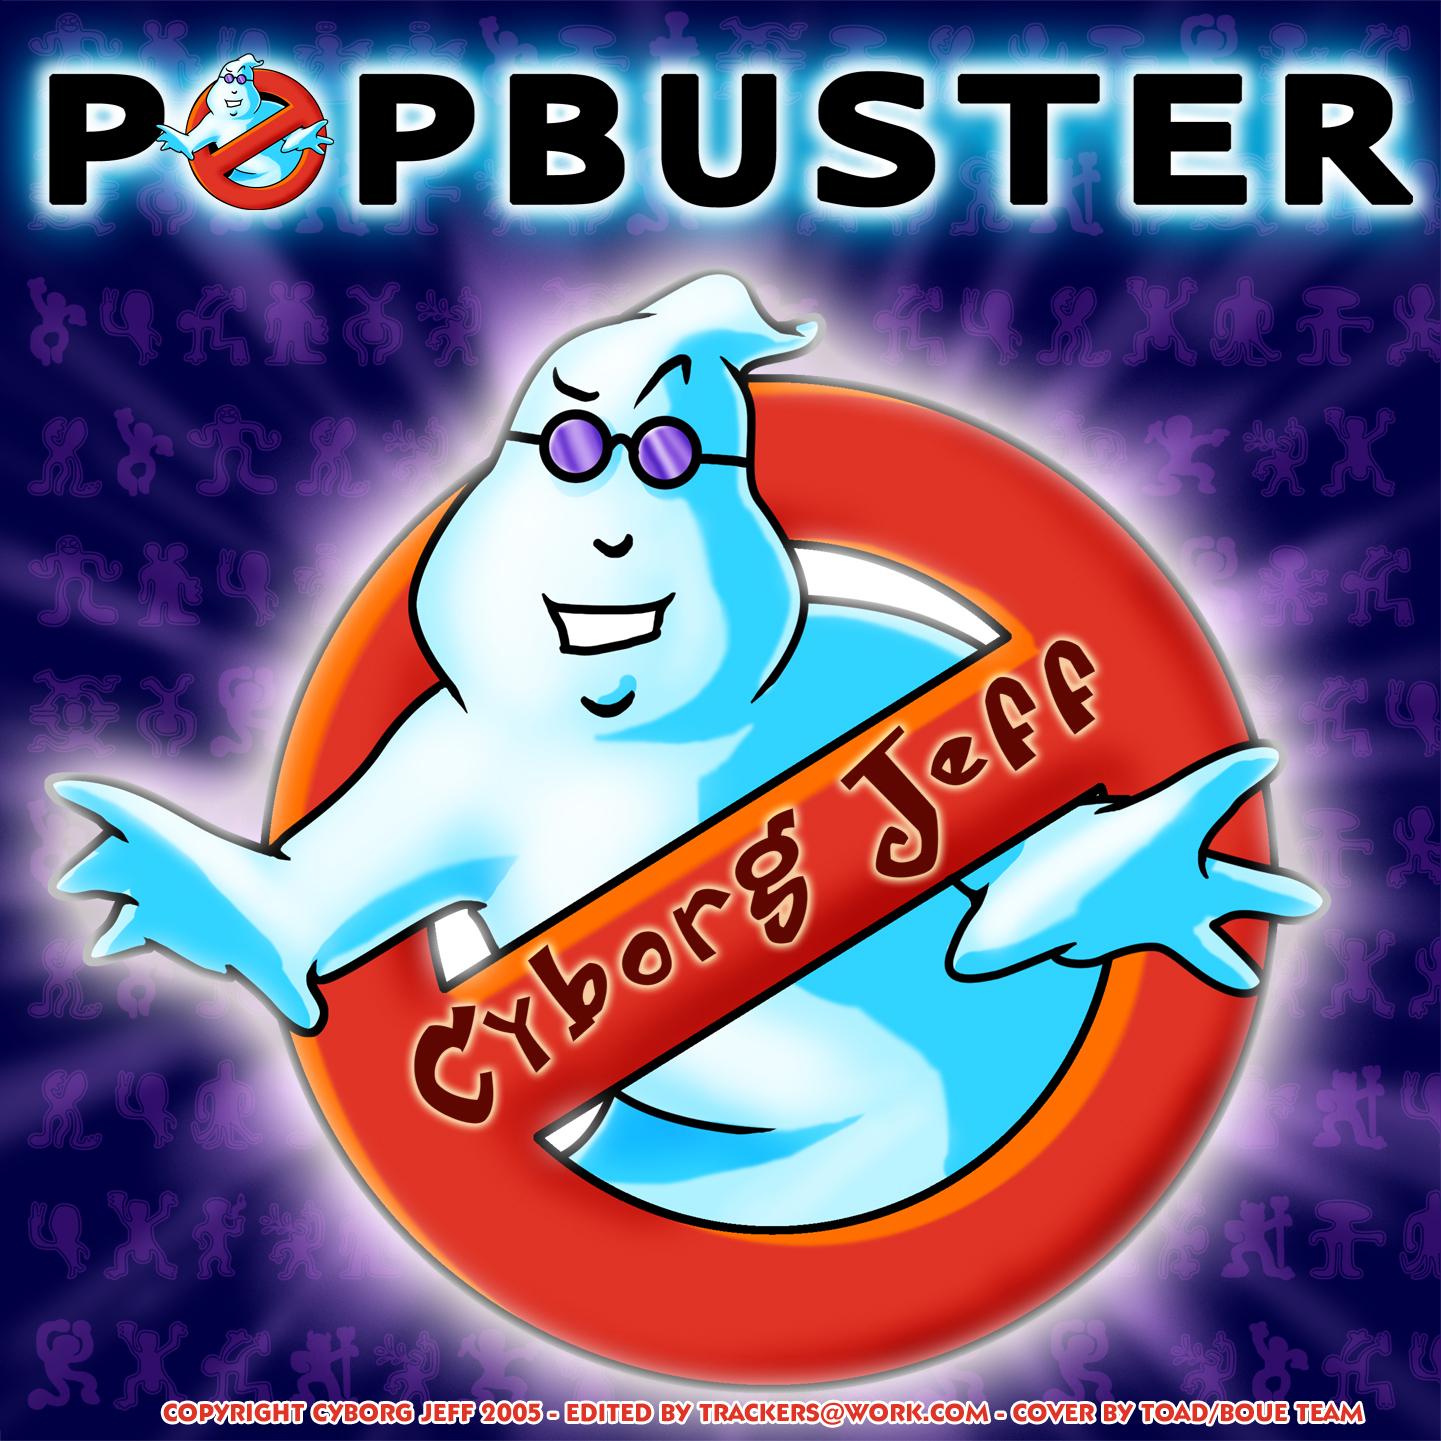 CD : Popbuster